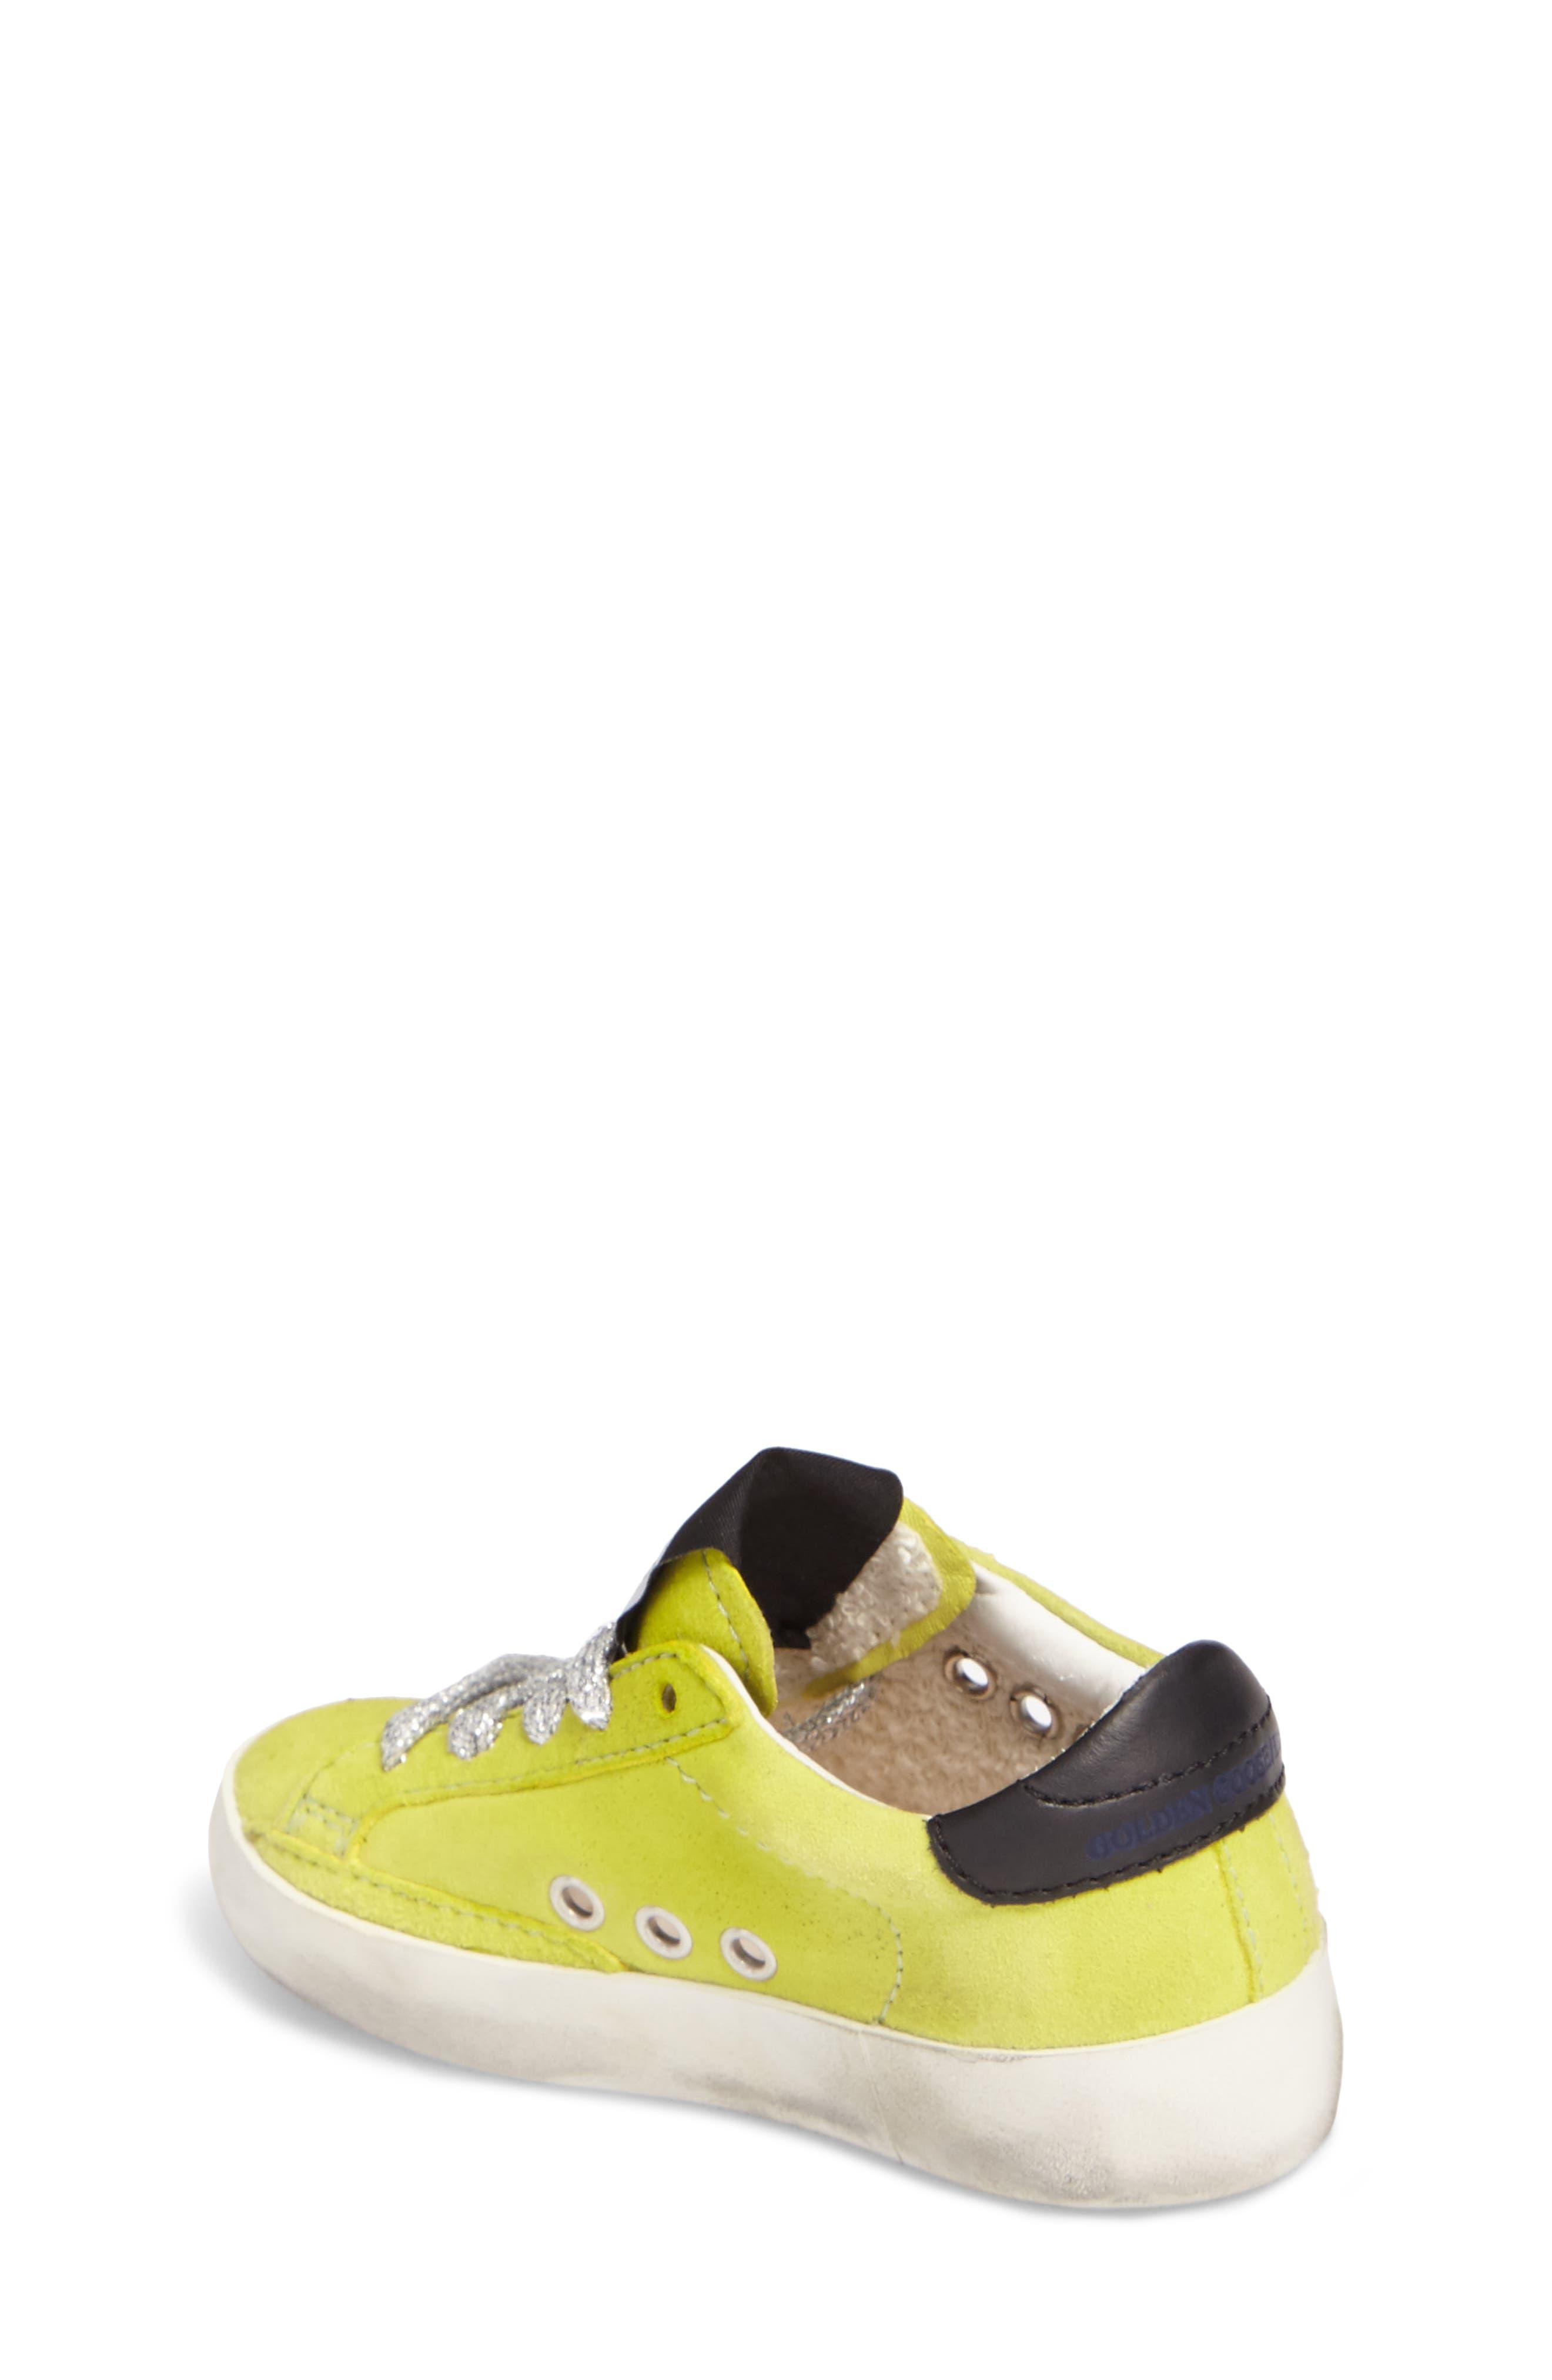 Superstar Low Top Sneaker,                             Alternate thumbnail 2, color,                             300